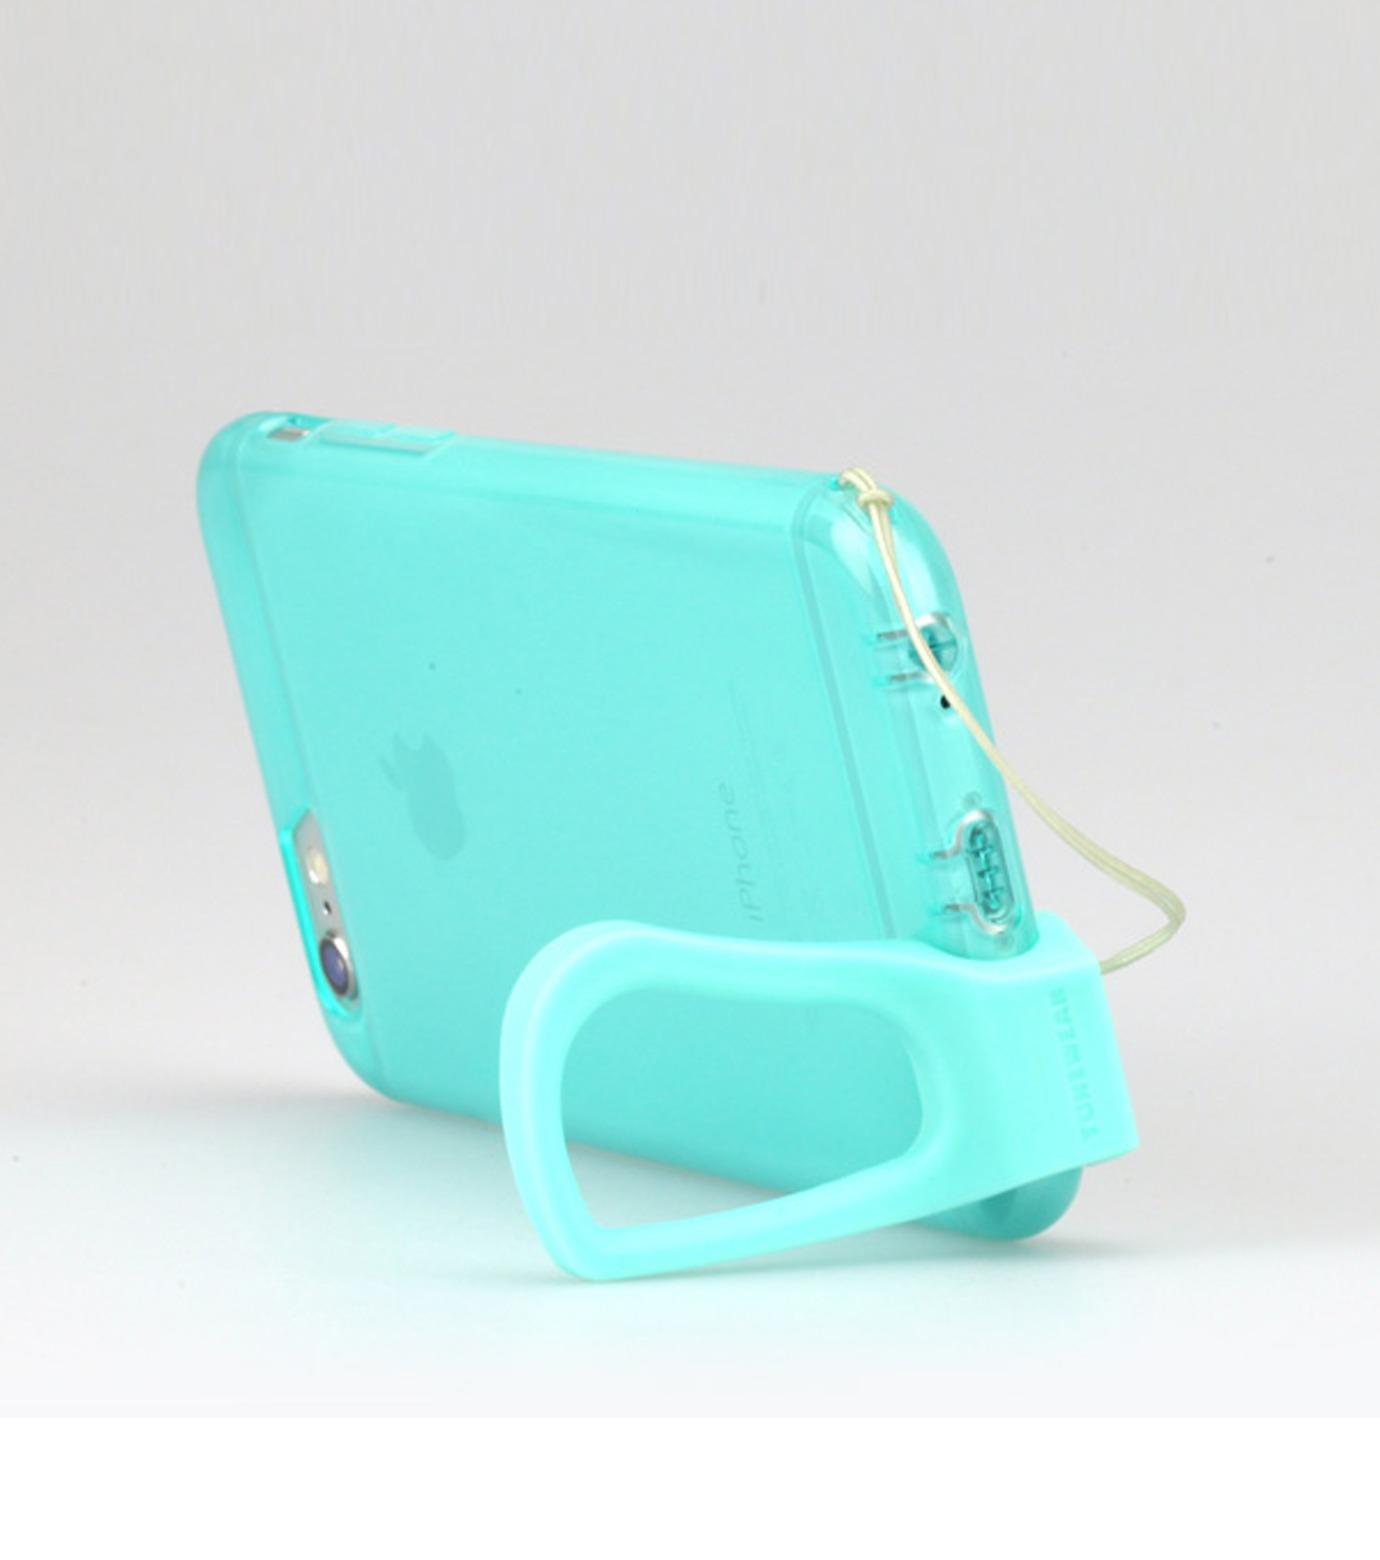 Tunewear(チューンウエア)のsoftshell 6/6s-NONE(ケースiphone6/6s/case iphone6/6s)-TUN-PH-0398-0 拡大詳細画像7